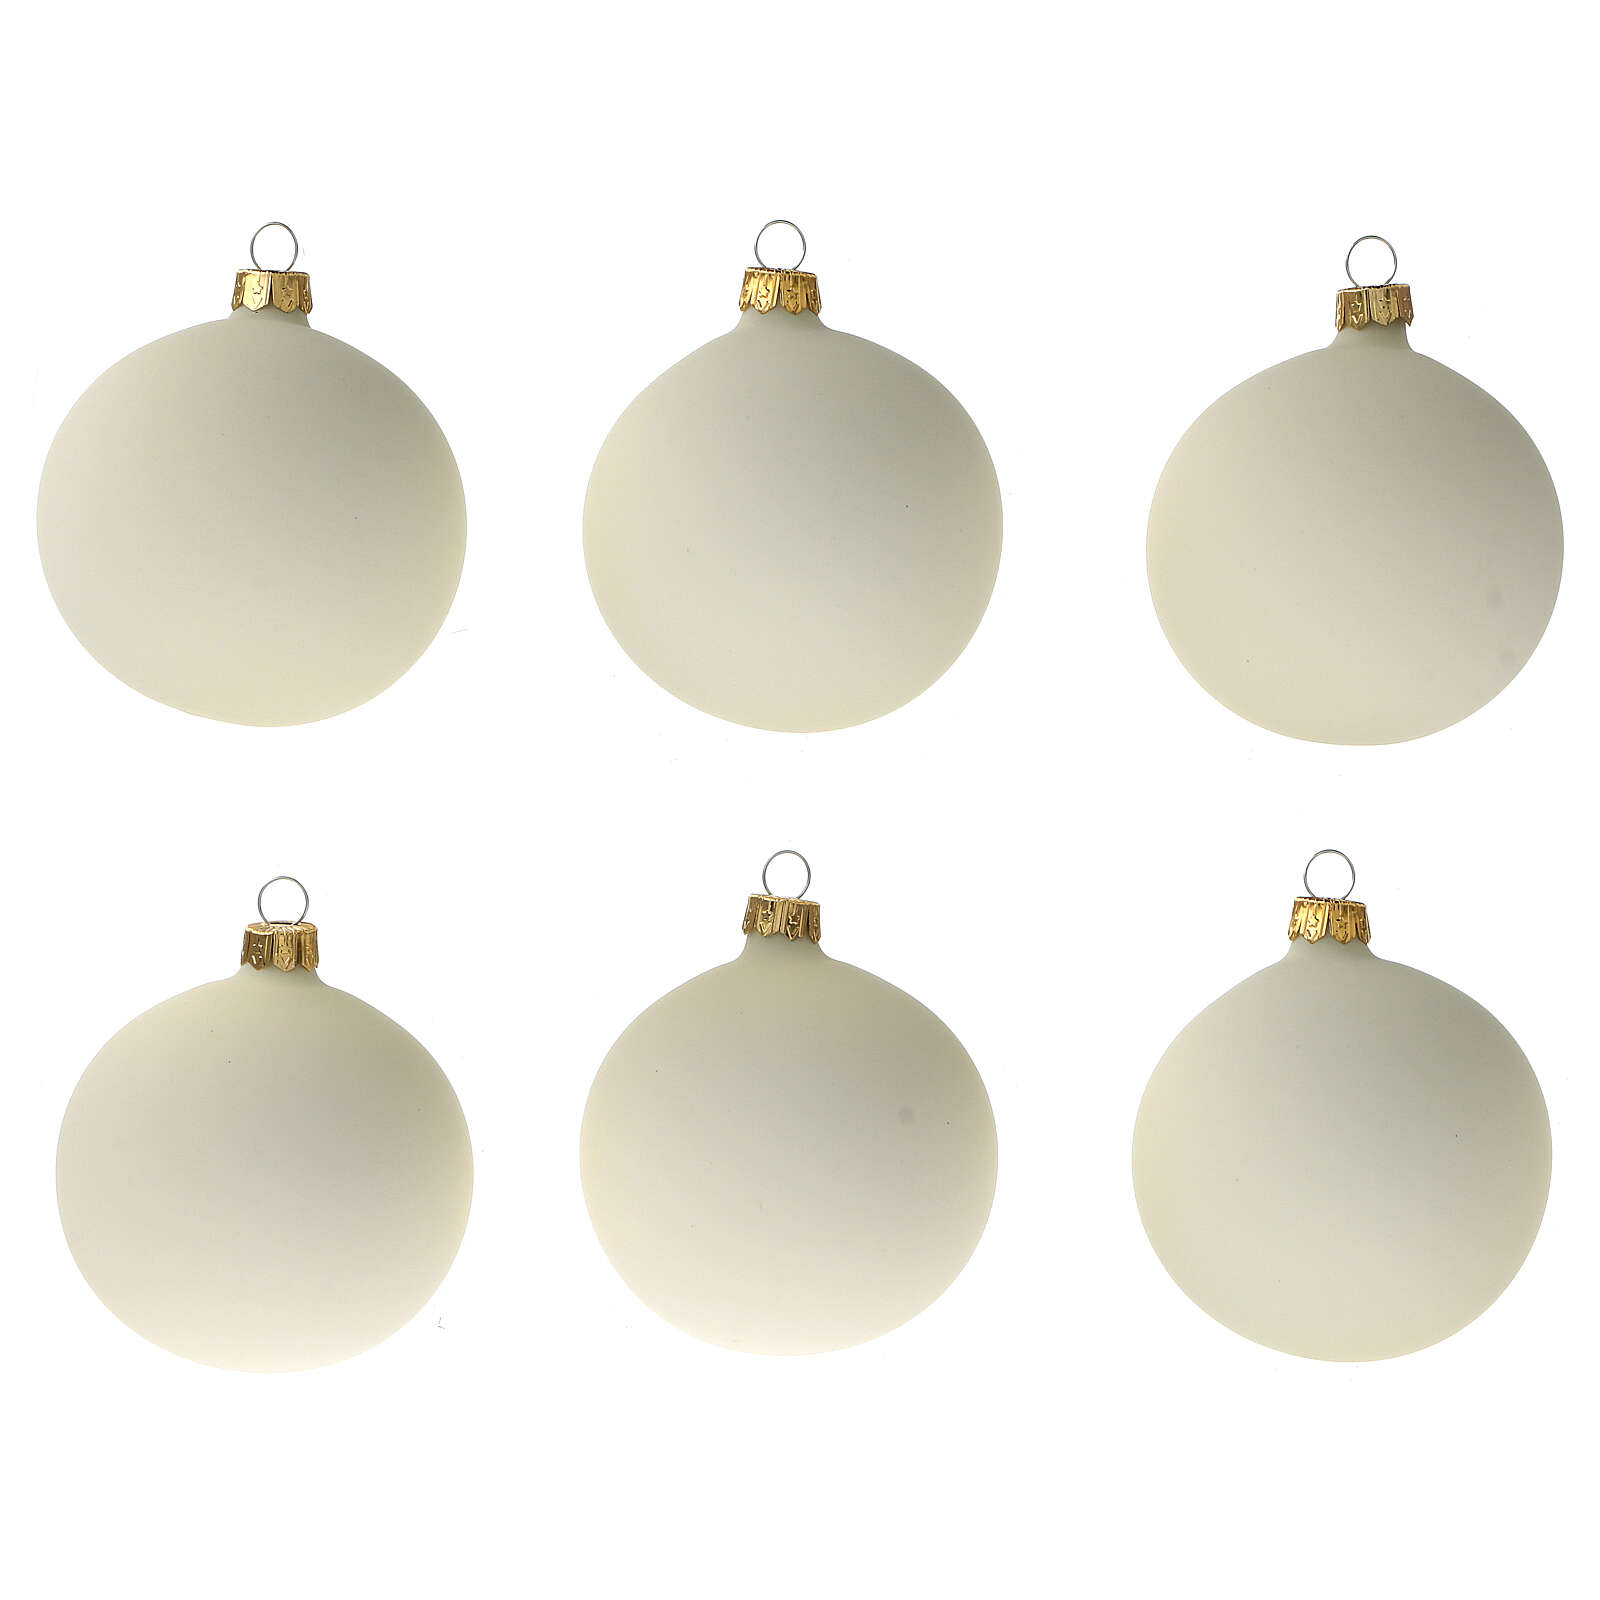 Cream Christmas ball ornament set 6 pcs 80 mm blown glass 4